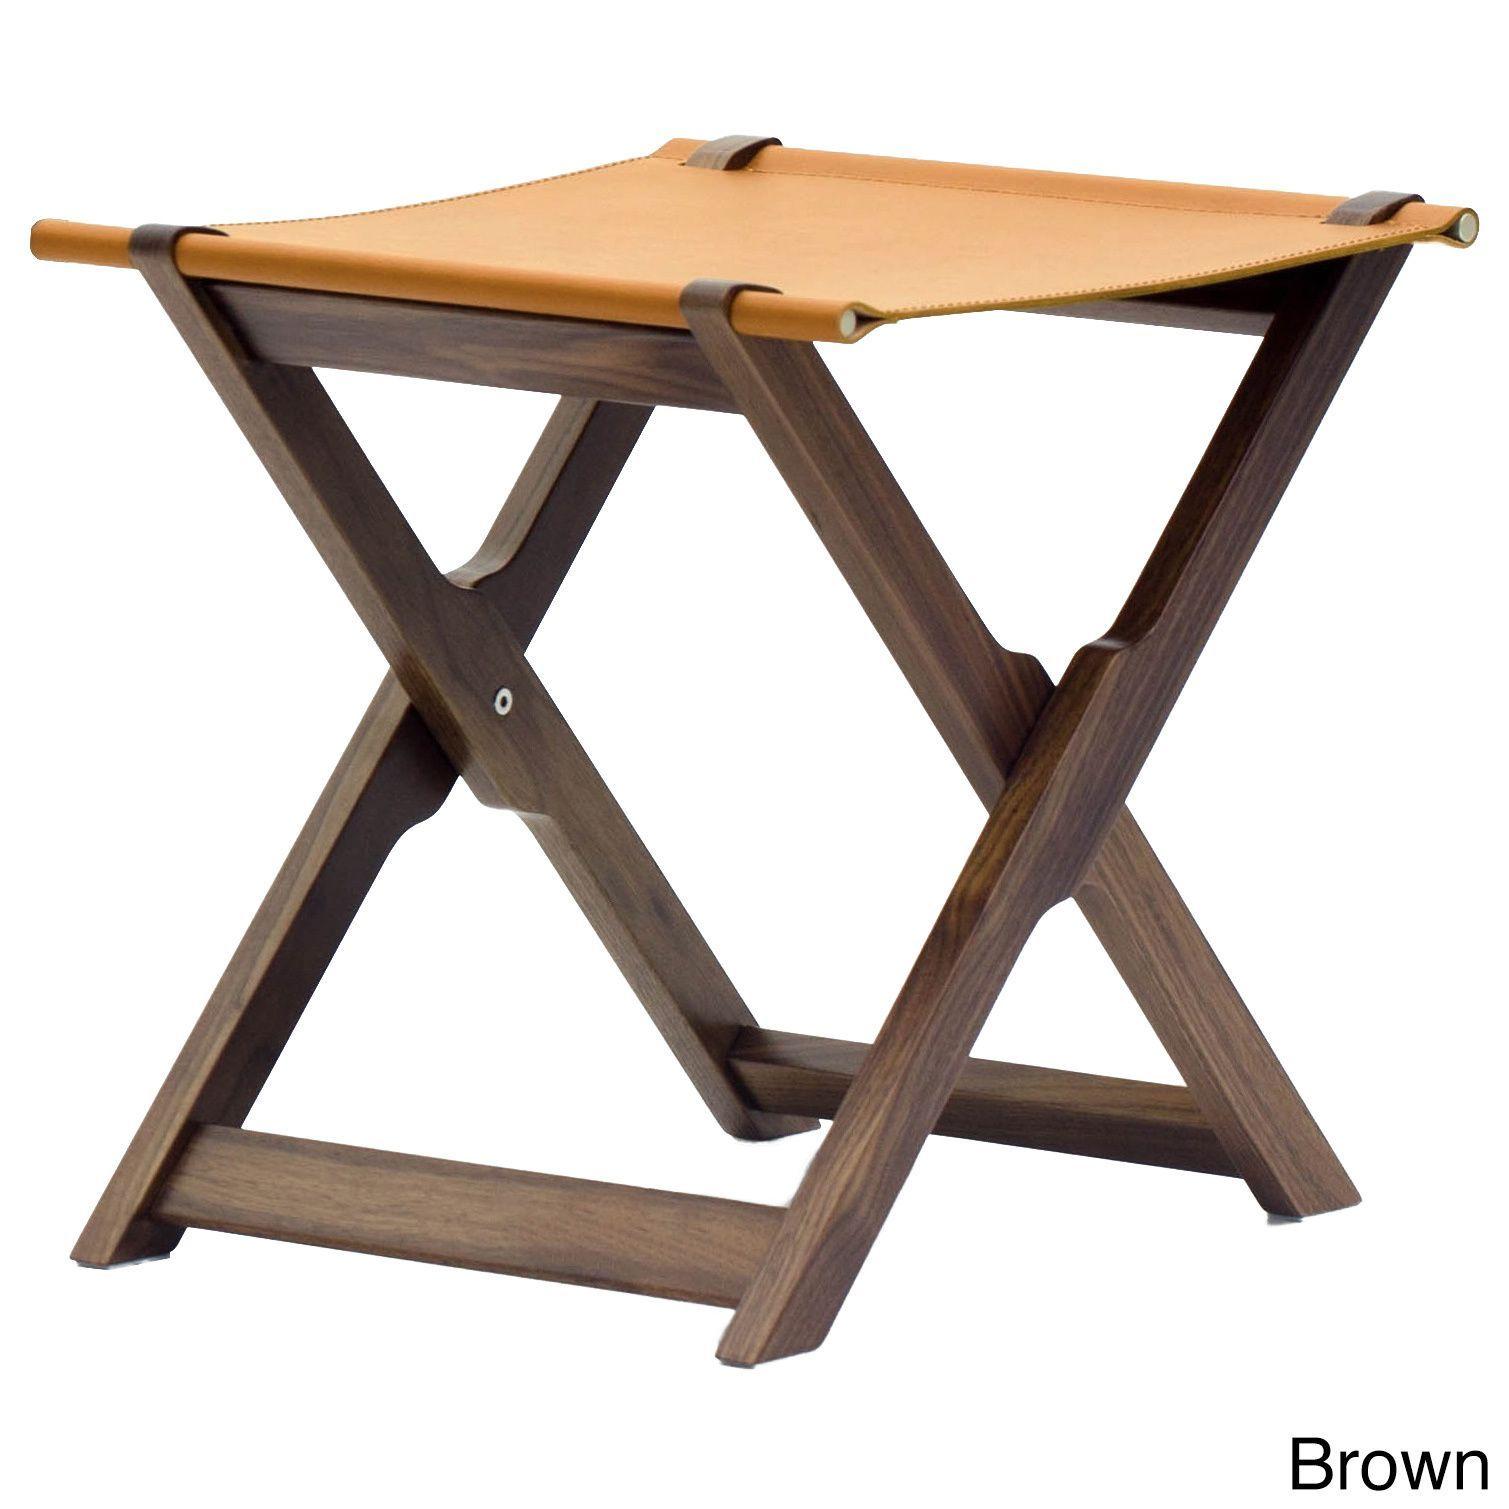 Argo Furniture Marchetti Coronado Folding Stool with Tray Black